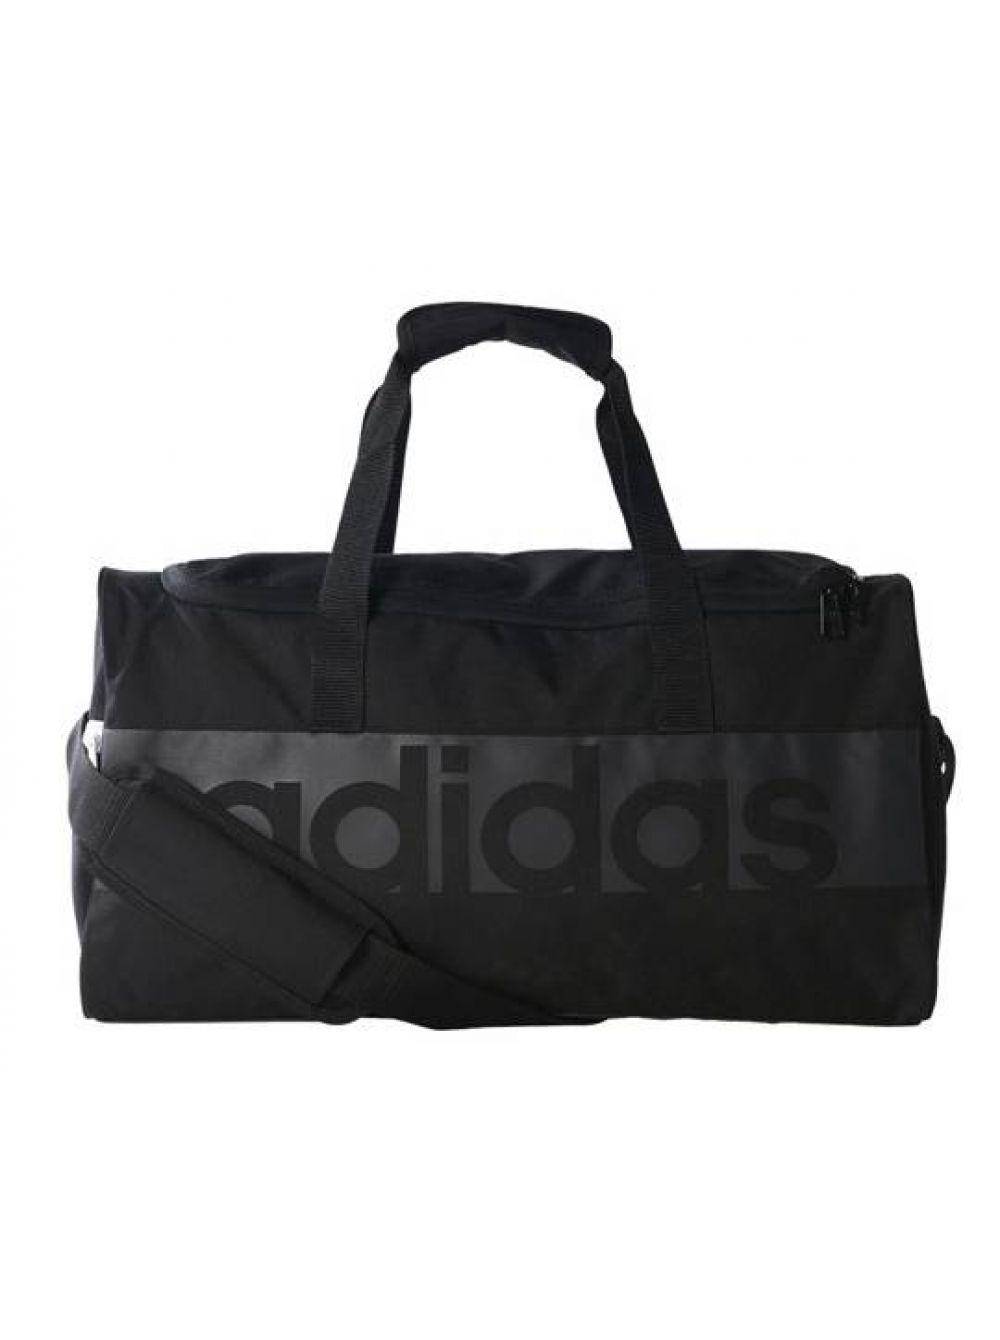 d1fe85e2 Купить спортивную сумку «Adidas Tiro 17 Linear Teambag S» черную